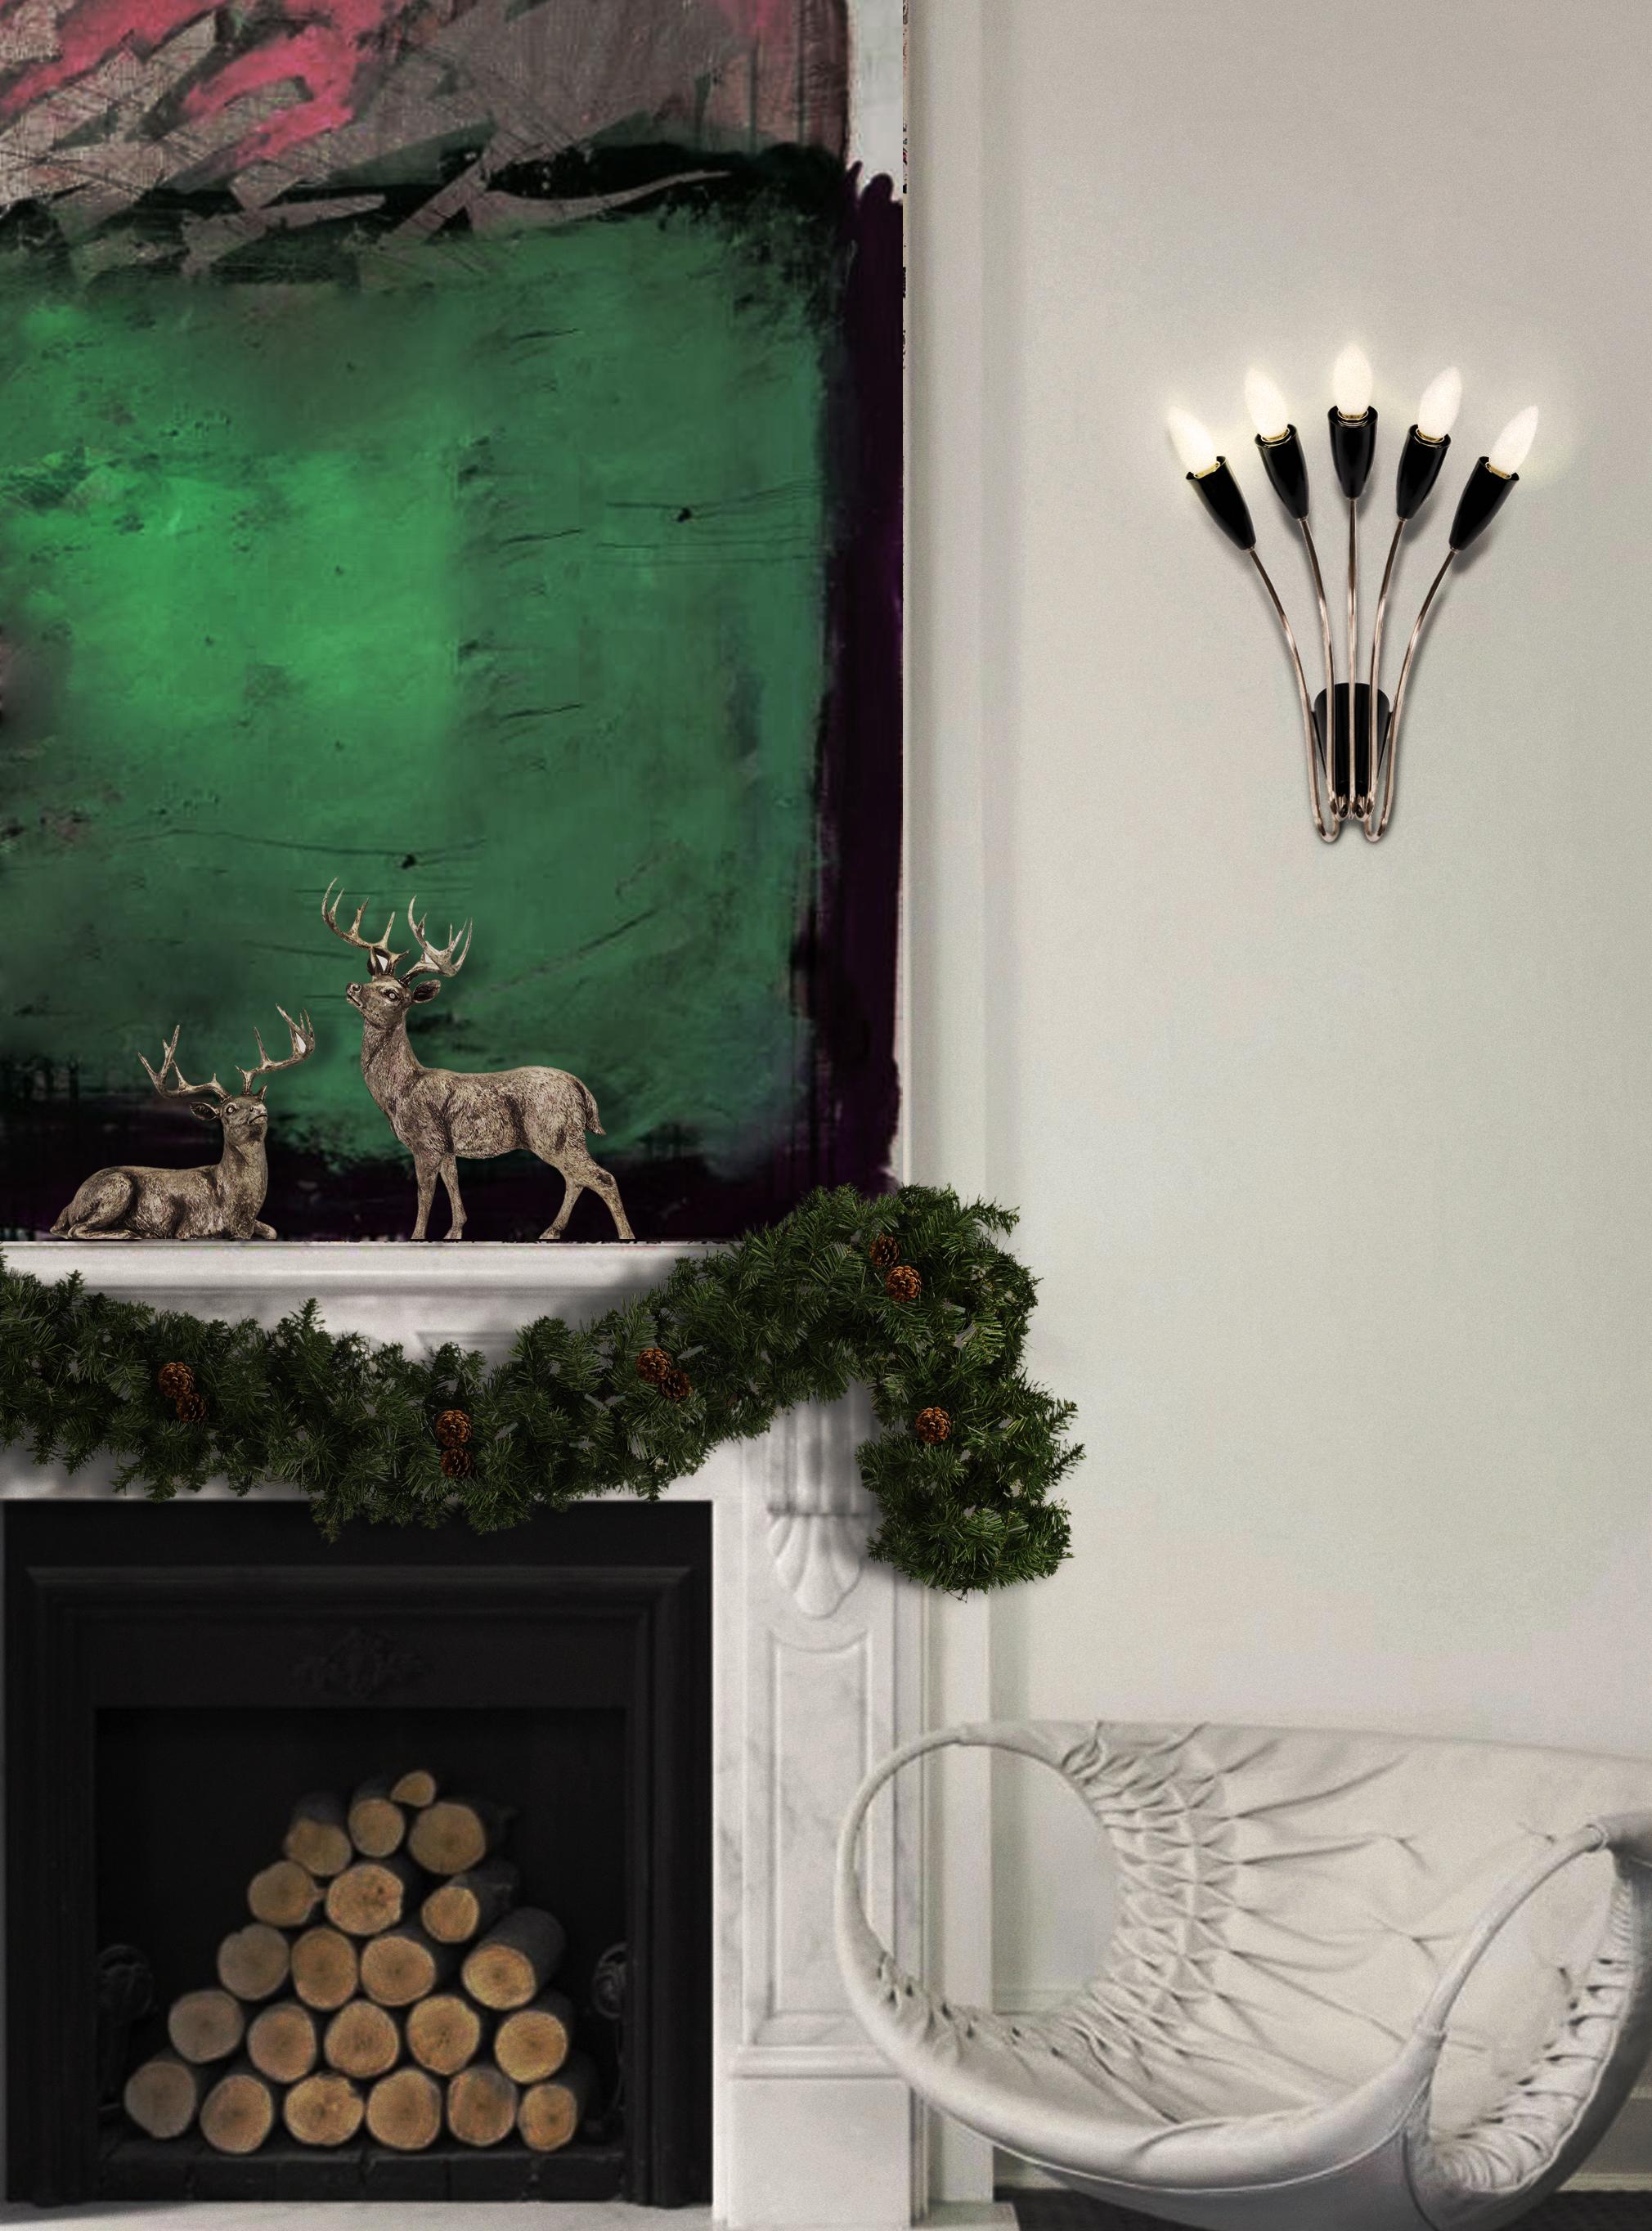 Top 7 Candeeiros Para Obter A Melhor Iluminação De Natal Em Sua Casa 6 iluminação de Natal